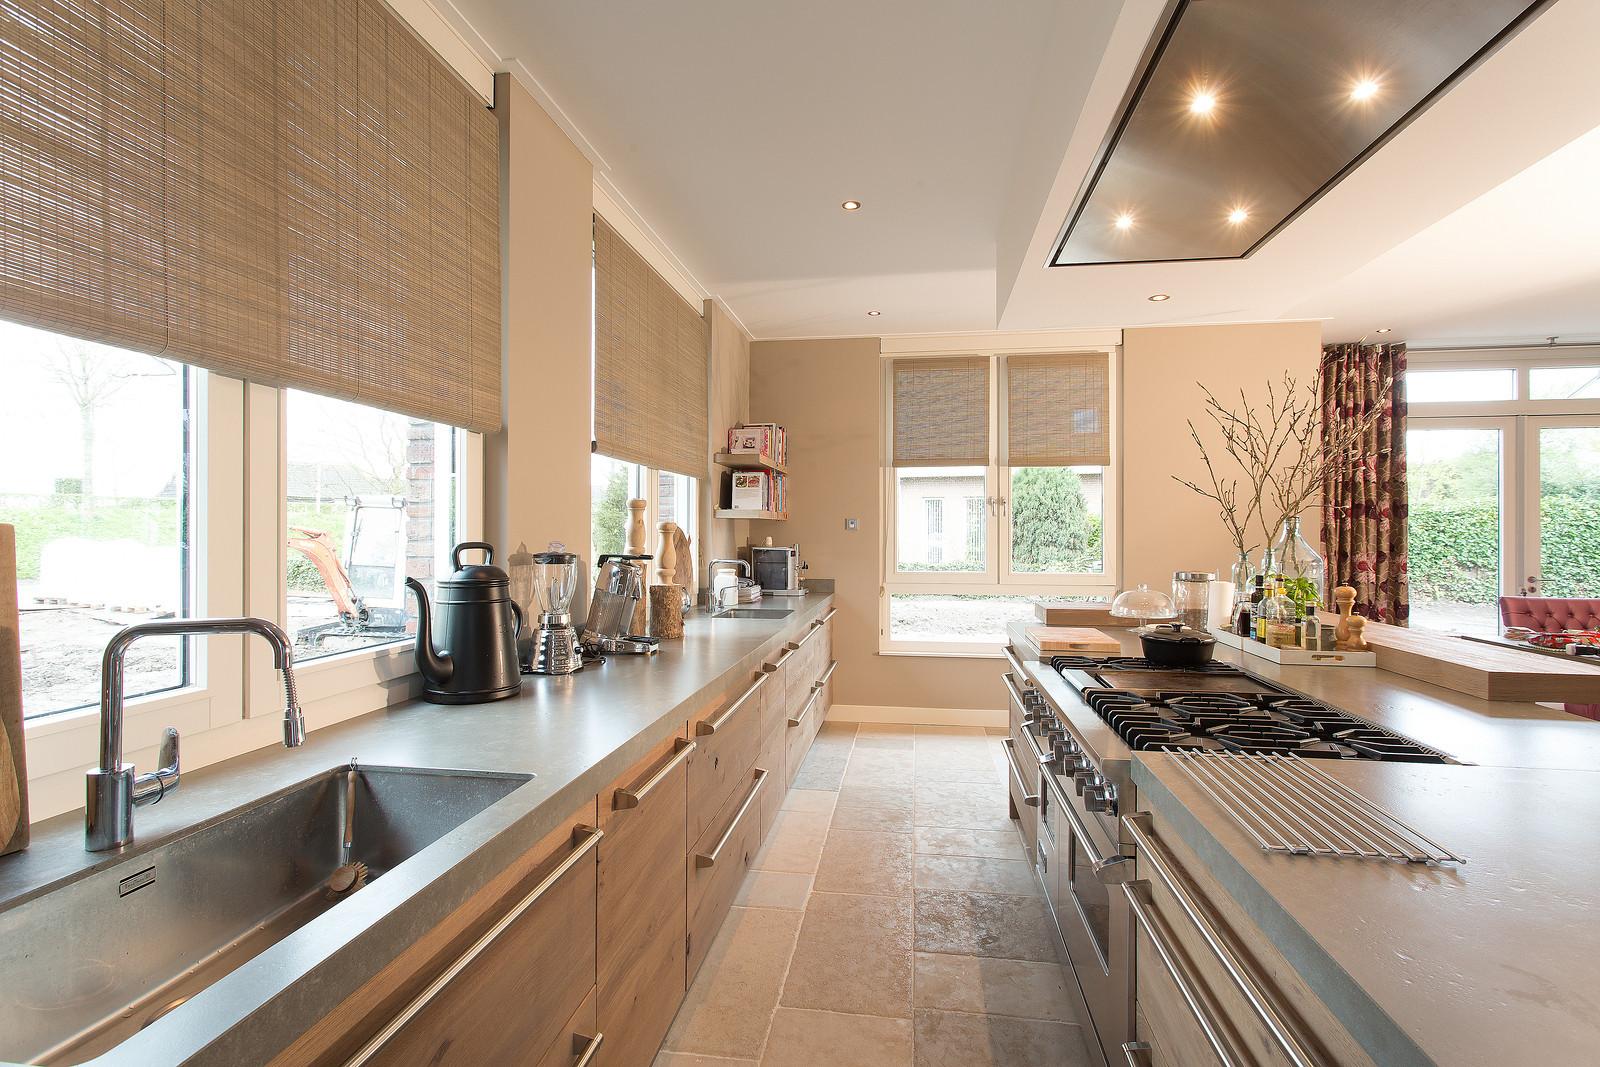 Riverdale Keuken Dealers : Keukens in MIDDELHARNIS Startpagina voor keuken idee?n UW-keuken.nl